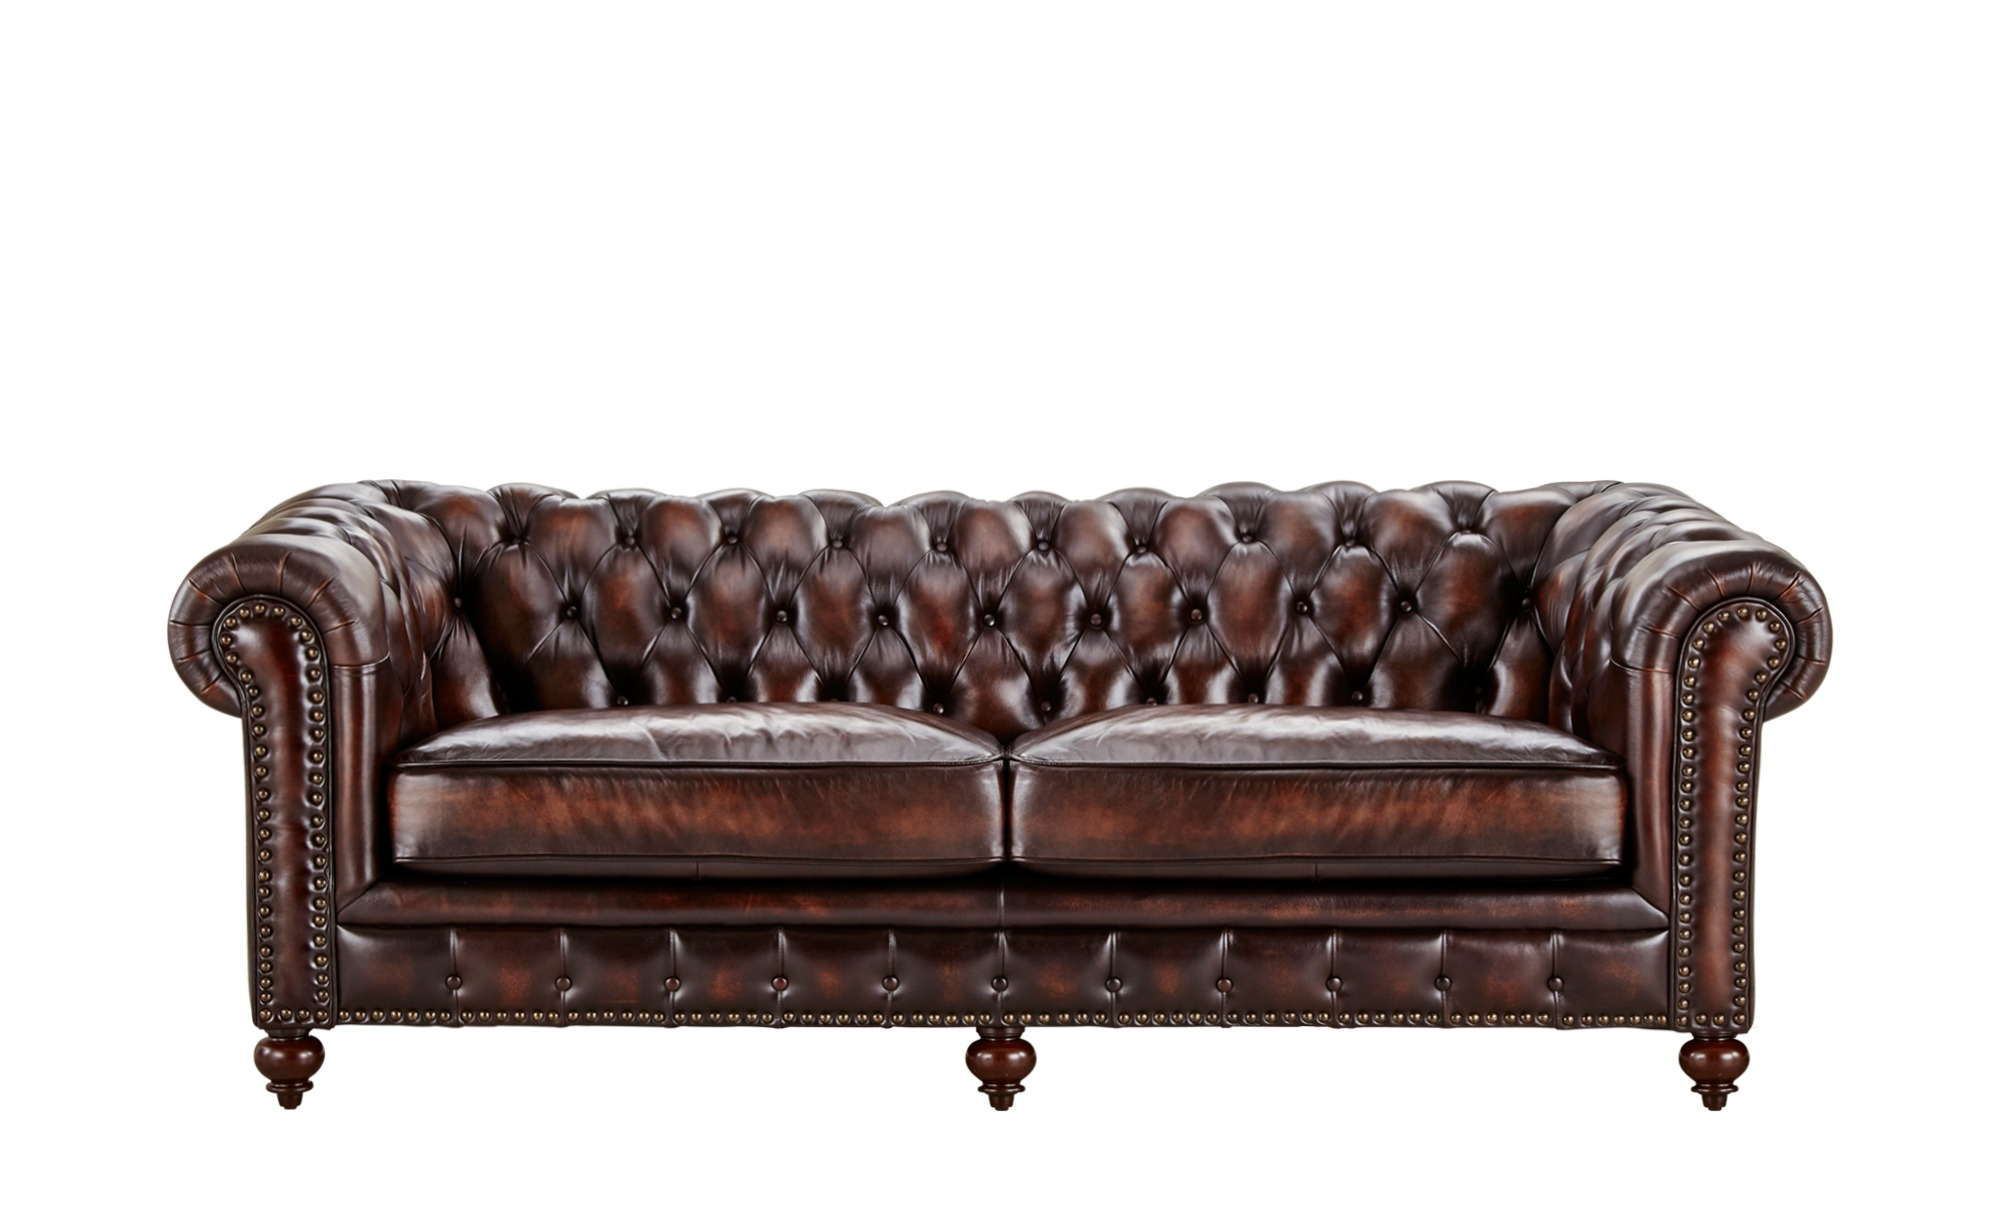 Uno Sofa 3 Sitzig Leder Chesterfield Braun 230 Cm 80 Cm 100 Cm Polstermobel Sofas 3 Sitzer Mobel Kraft Wohnwelten Shop De Sofa Leder Braun Echt Leder Sofa Sofa Leder